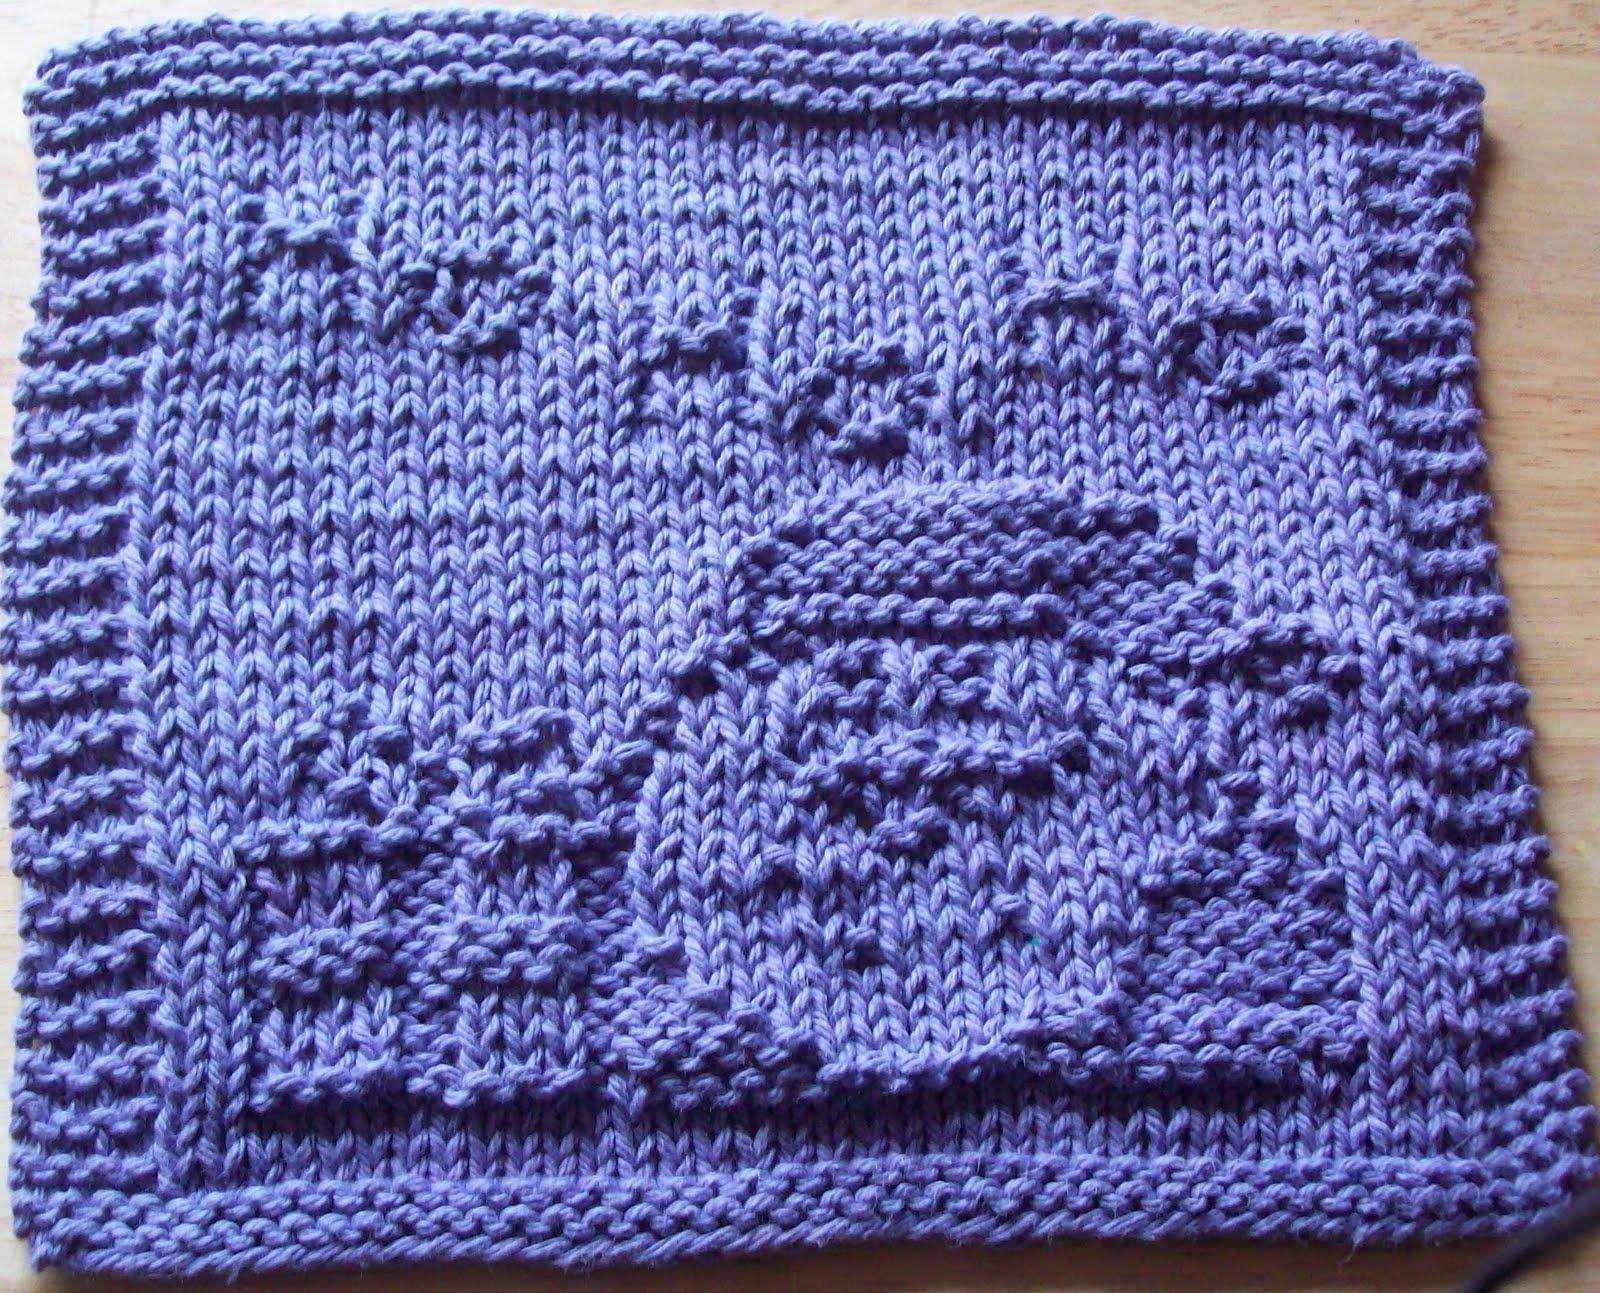 Christmas Dishcloth Knitting Patterns : Digknitty designs santa ho knit dishcloth pattern